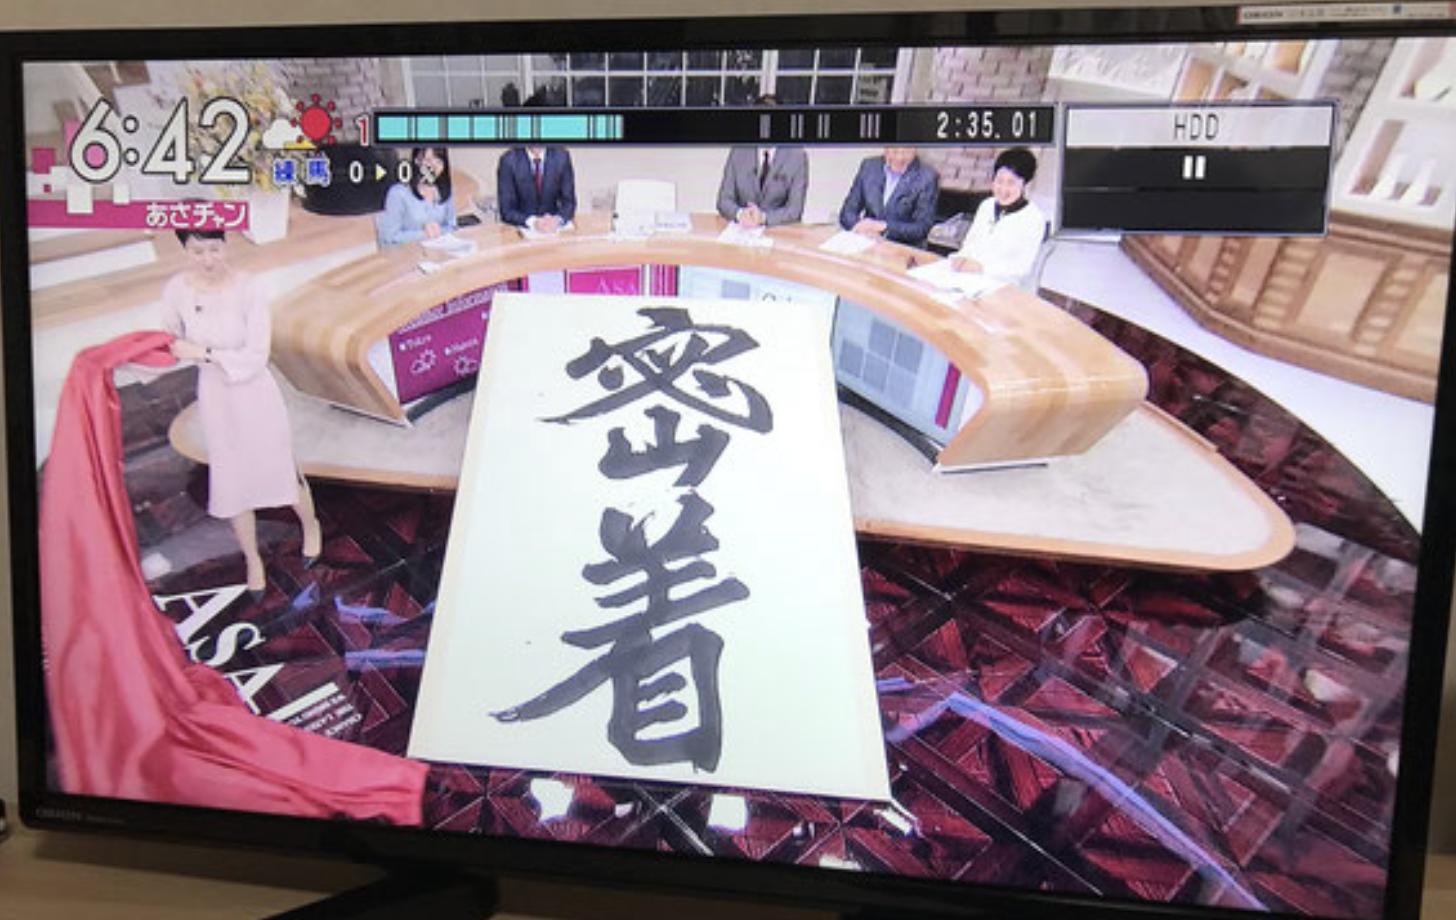 2017/1/4TBSテレビ あさチャン!に出演と密着取材コーナー『密着』の書かせて頂きました